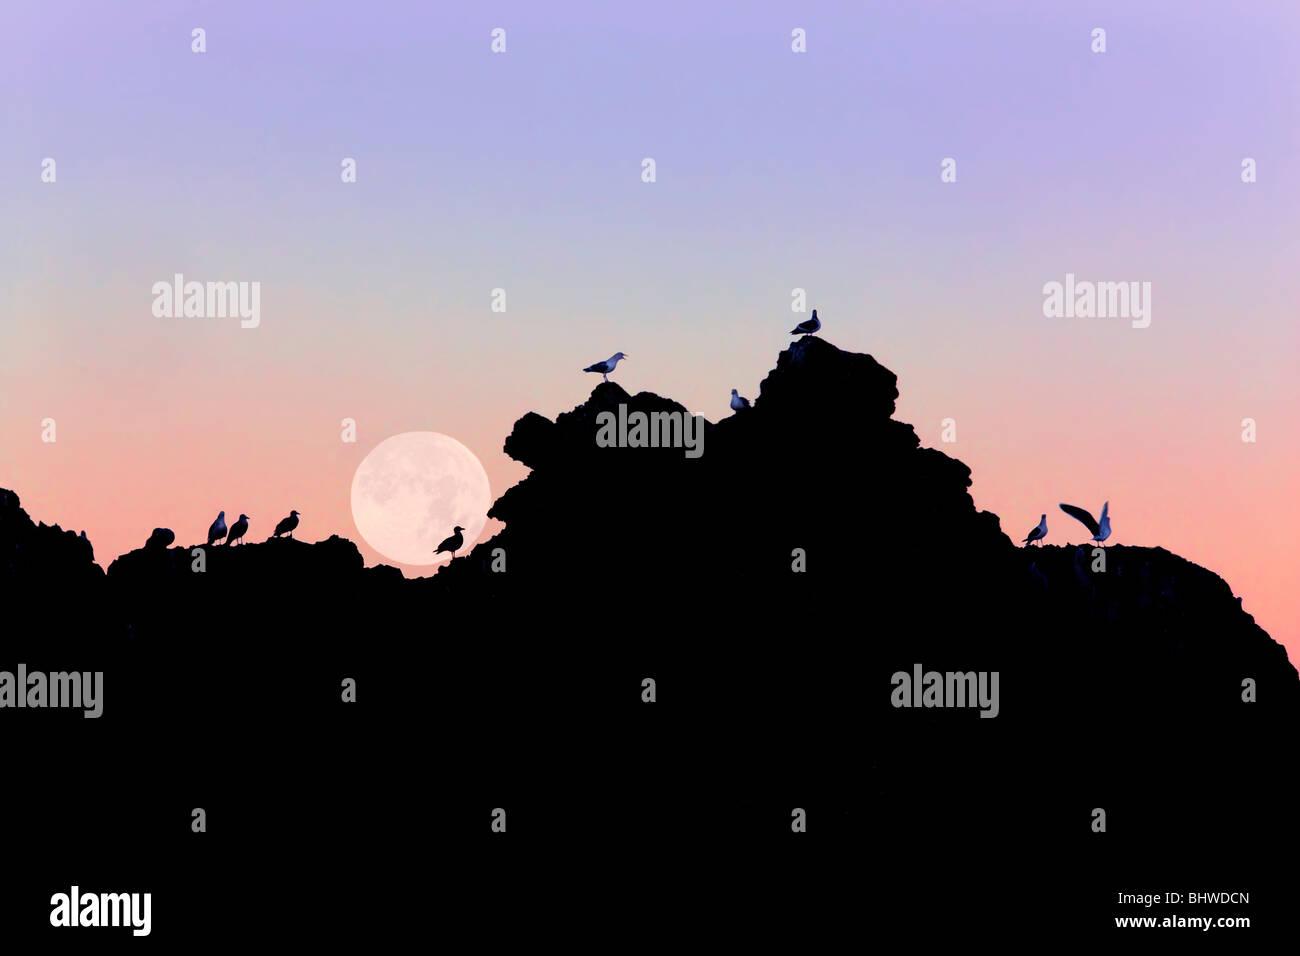 Full moon setting over rock at Bandon Beach with seagulls. Bandon, Oregon - Stock Image